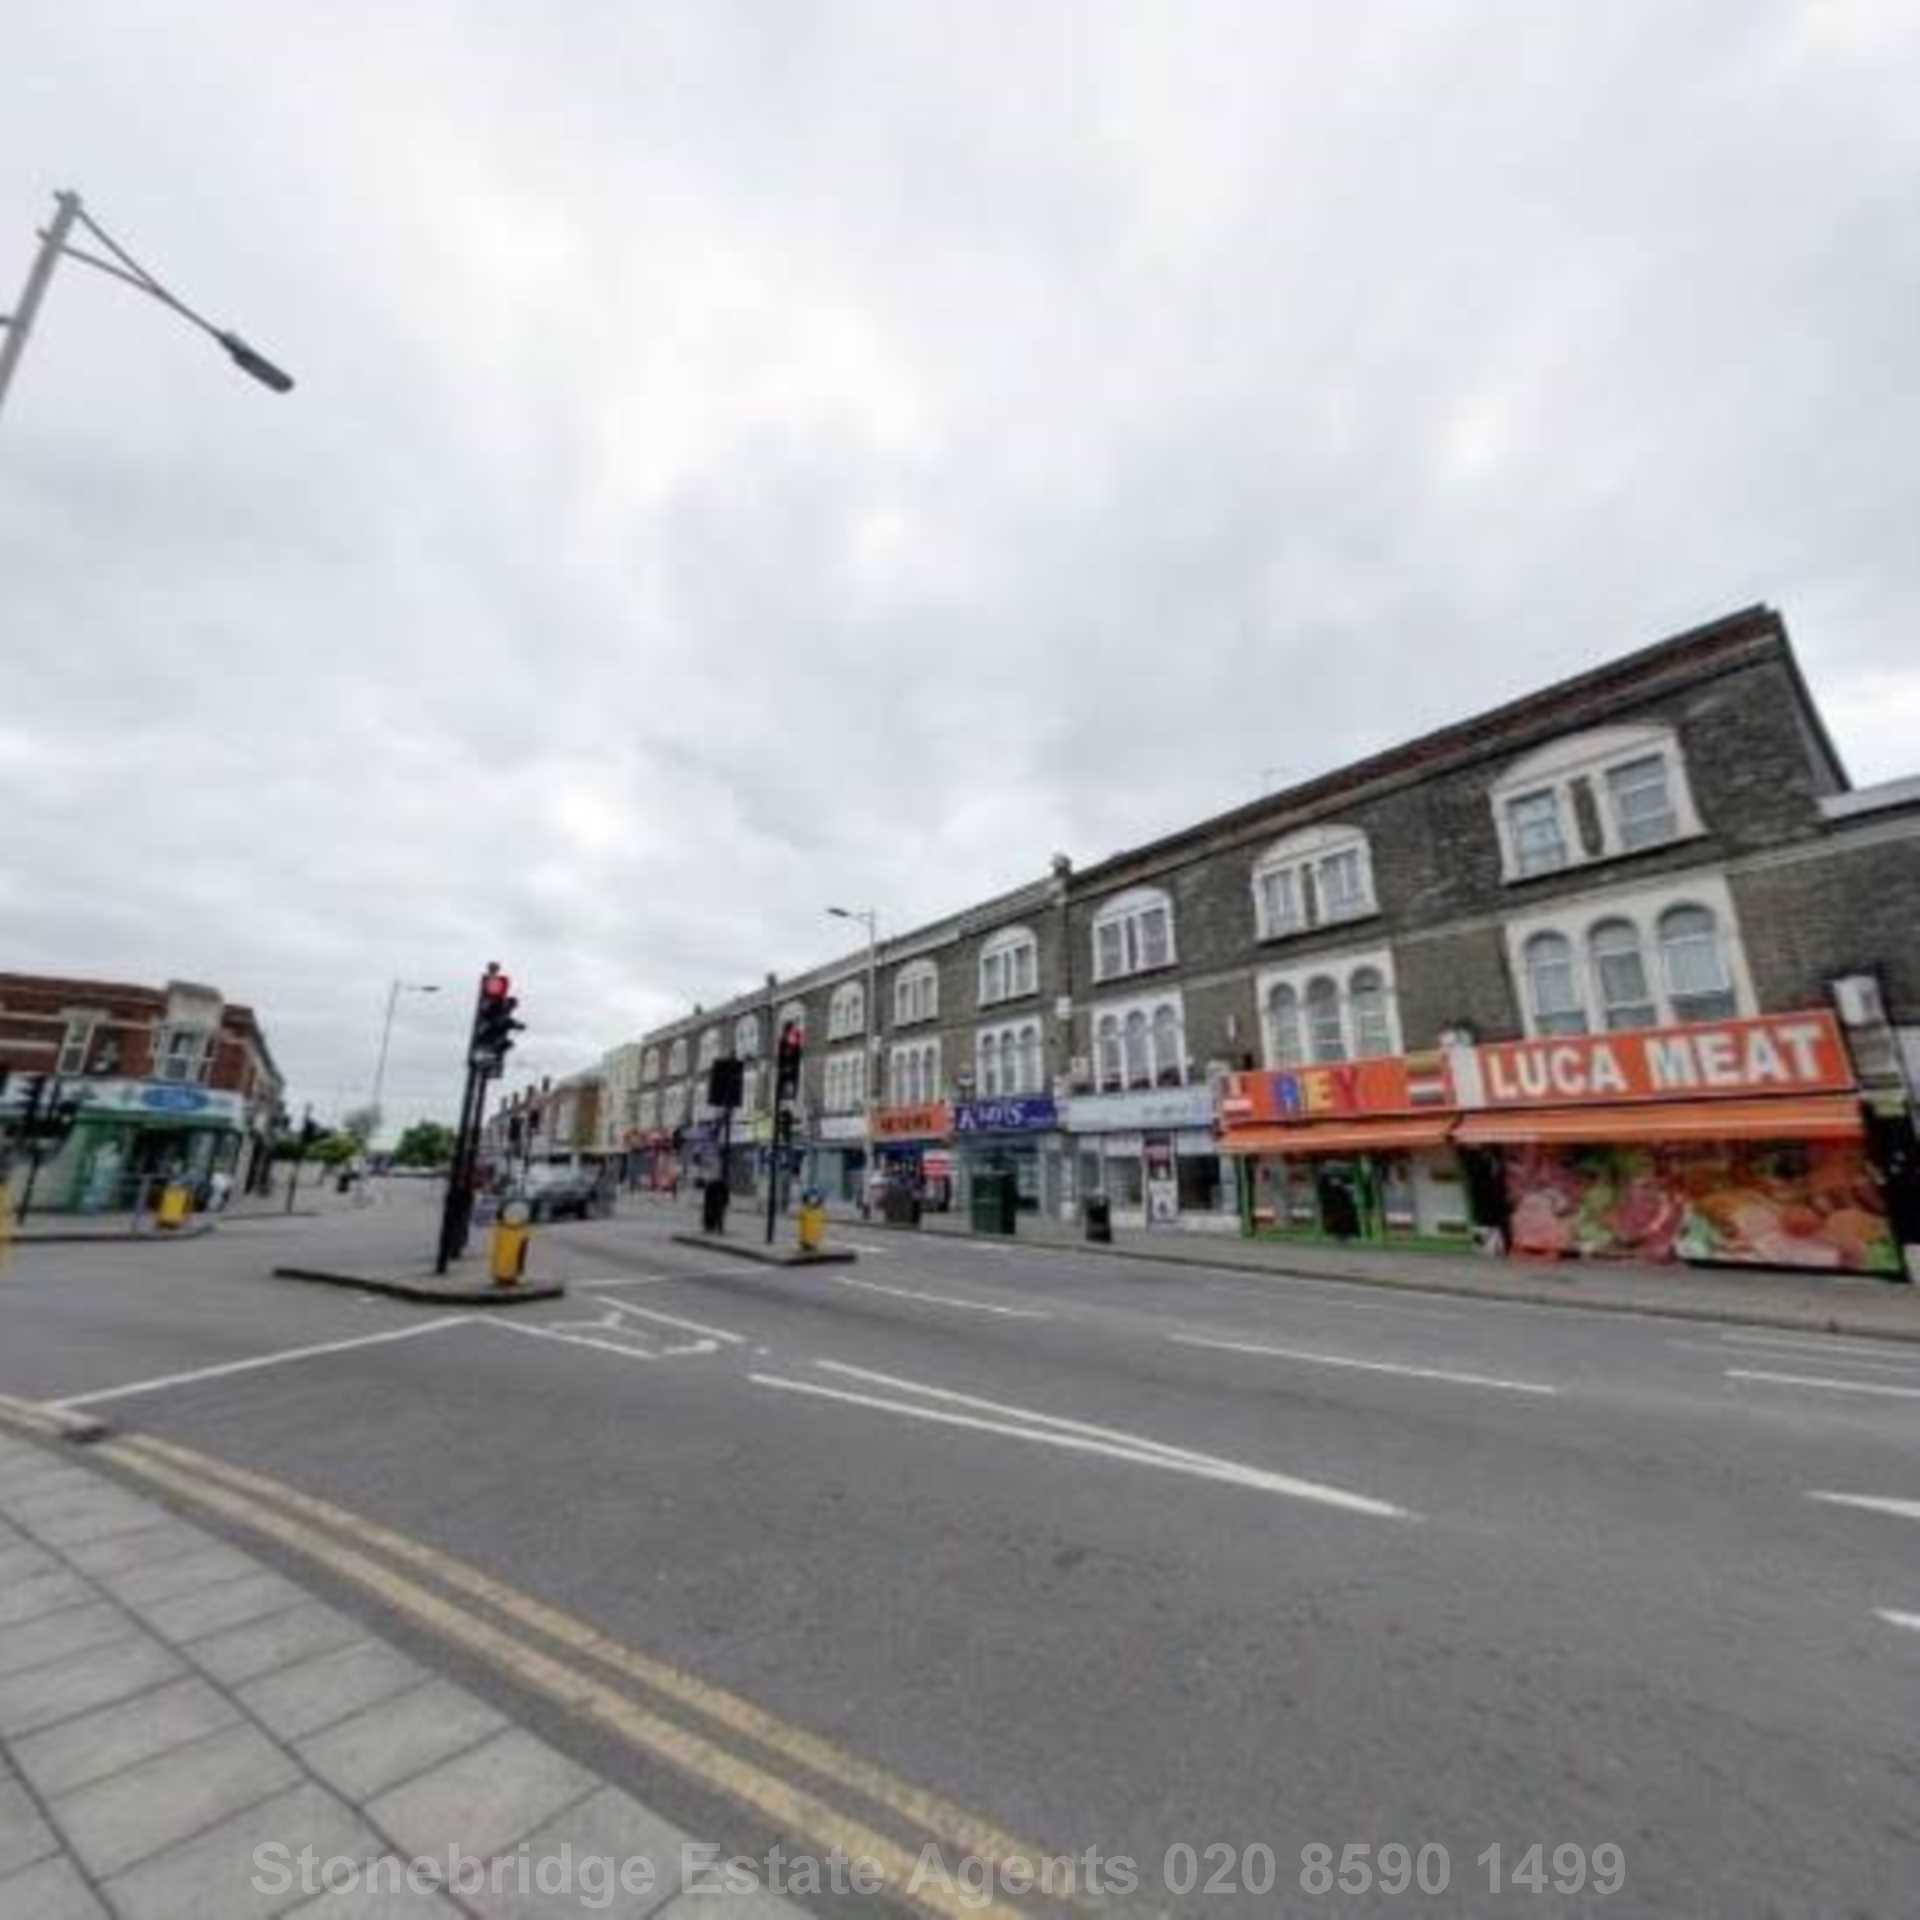 Green Lane, Seven Kings, IG3 9RH, Image 5